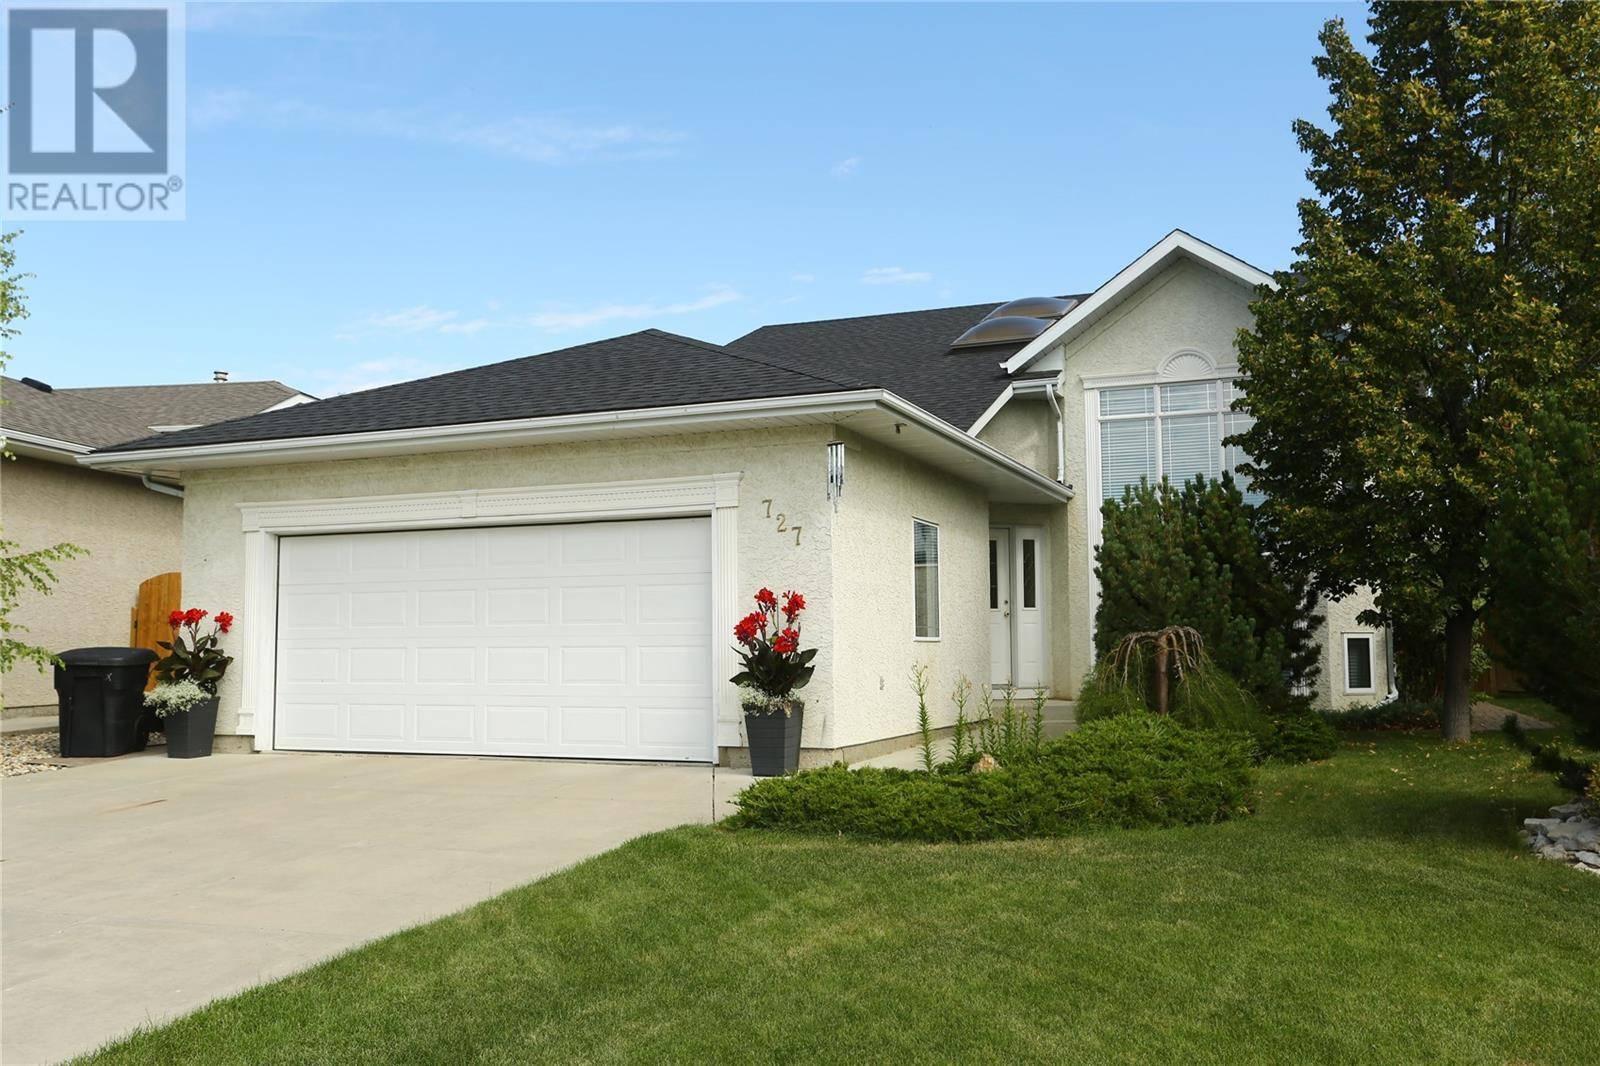 House for sale at 727 Bayview Cs Saskatoon Saskatchewan - MLS: SK784021